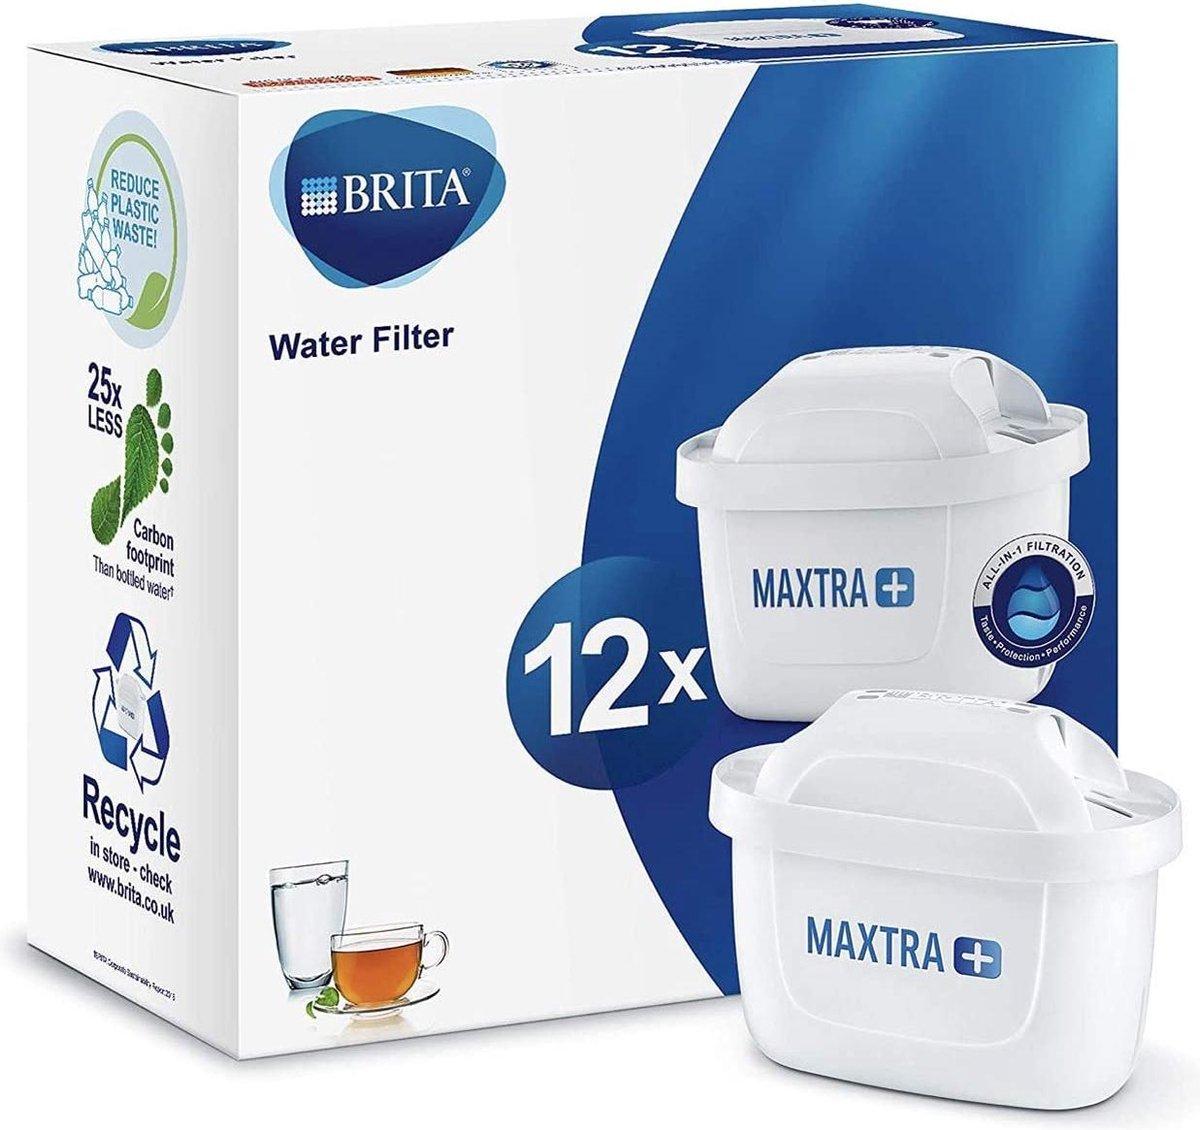 BRITA Maxtra+ Filterpatronen - 12 stuks - verbeterde filterprestaties